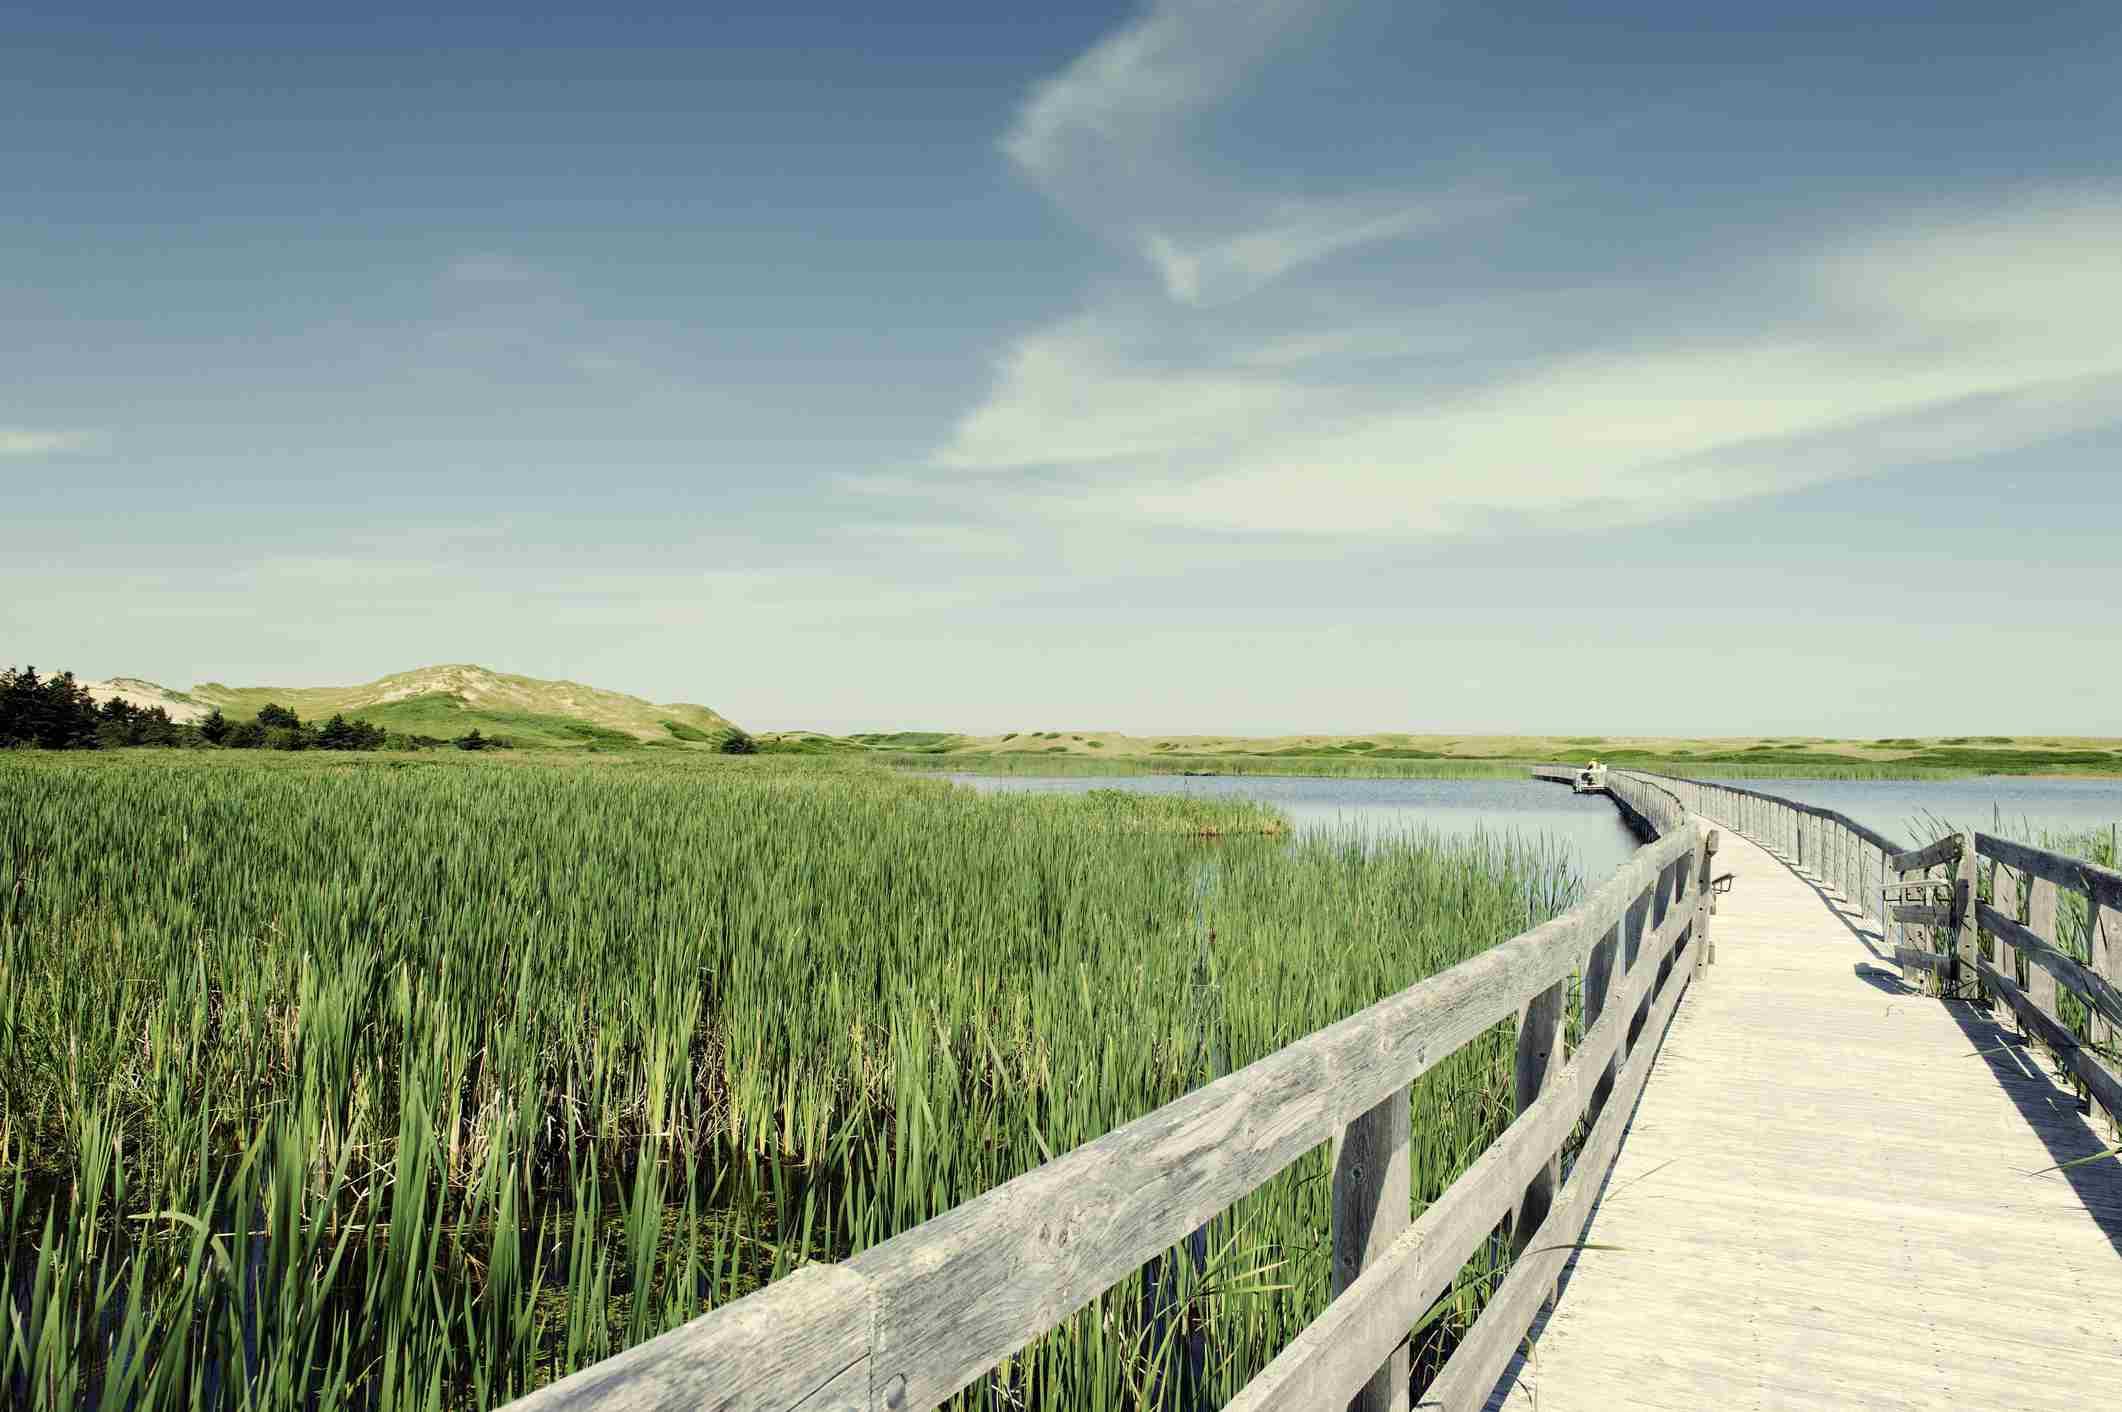 Boardwalk over Bowley Pond, Prince Edward Island National Park, Canada